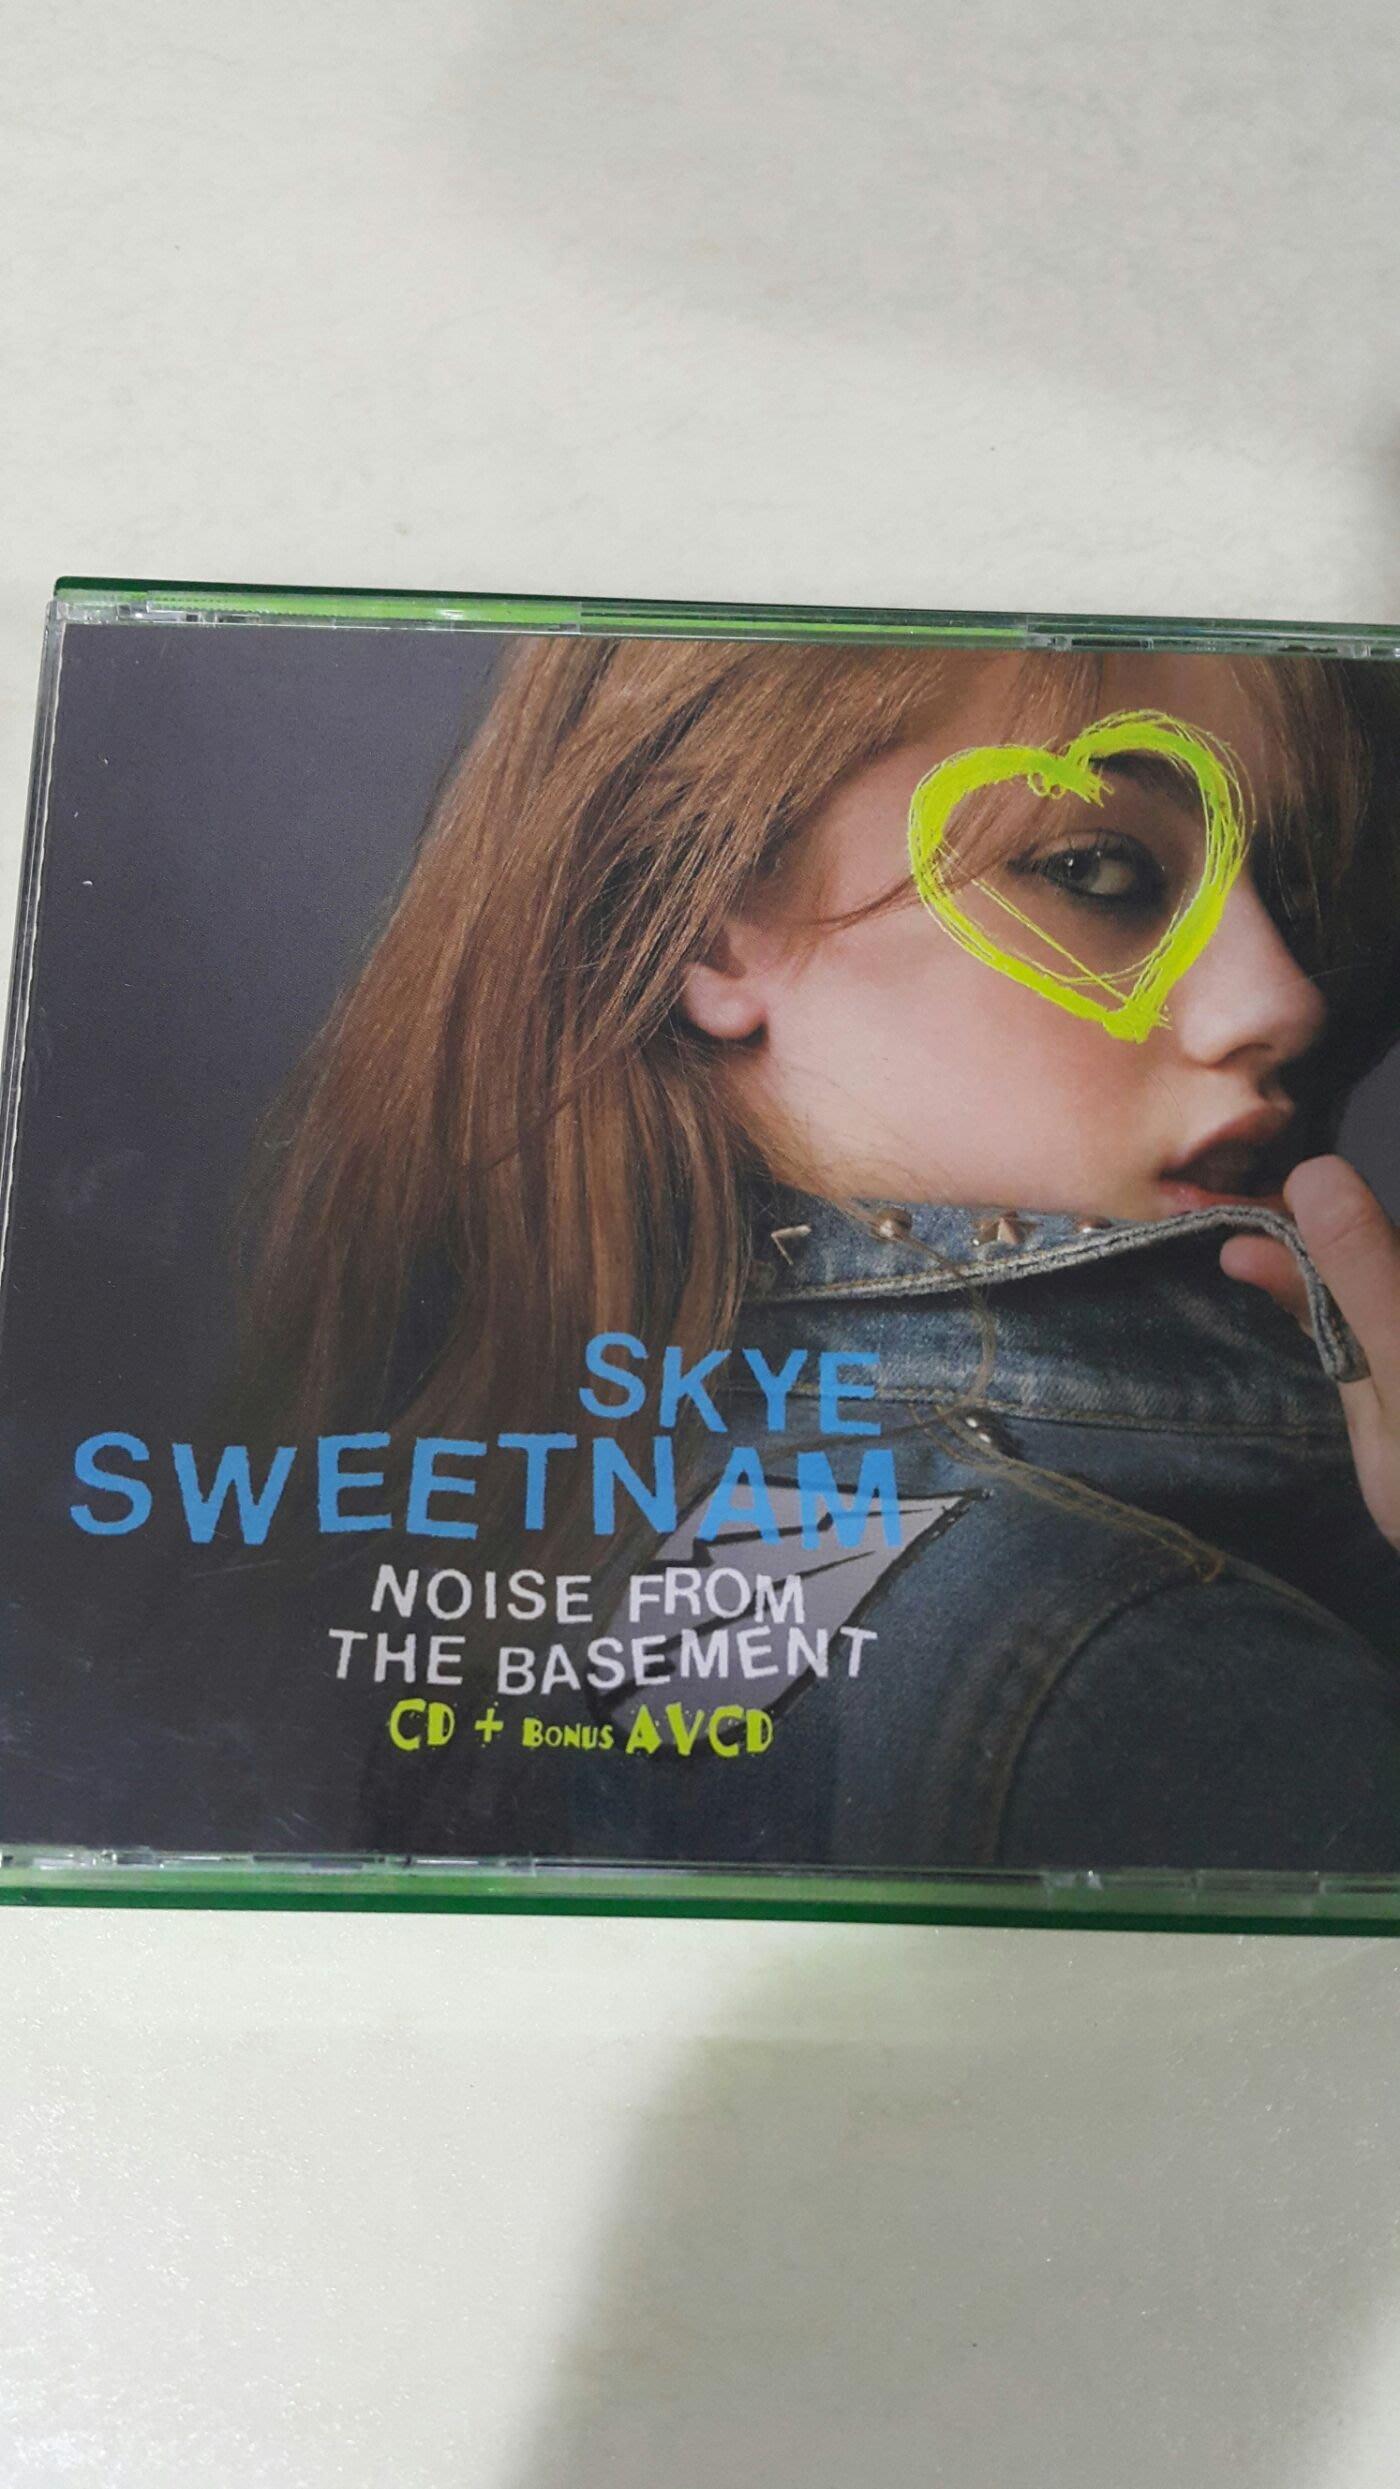 SKYE SWEETNAM NOSIE FROM THE BASEMENT CD+ BOUNS AVCD